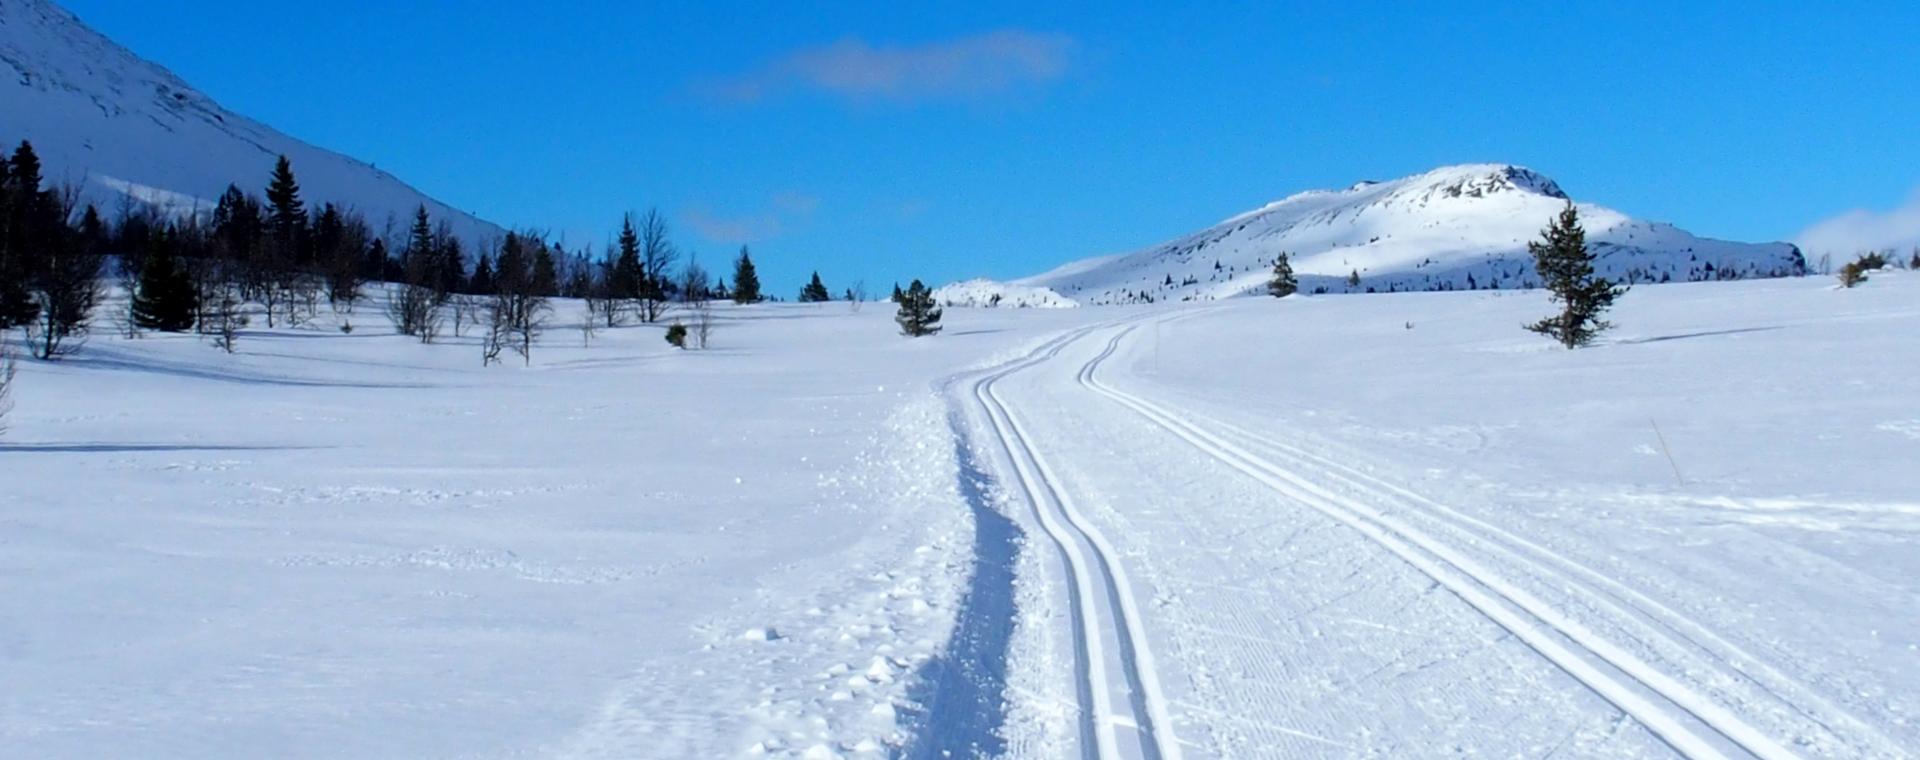 Image Séjour ski de fond à Venabu